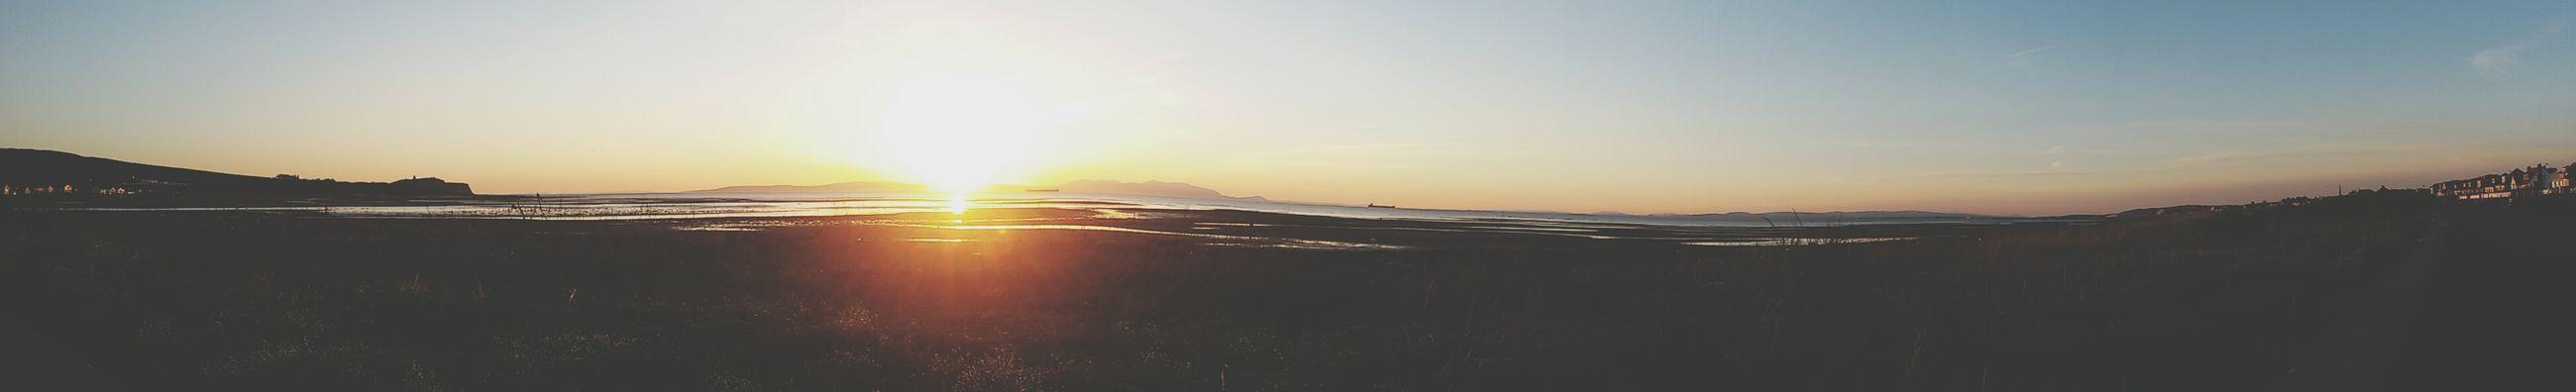 Sea Beach Sunset Scotland Blury Sky Colours Pretty Silhouettes Landscpe